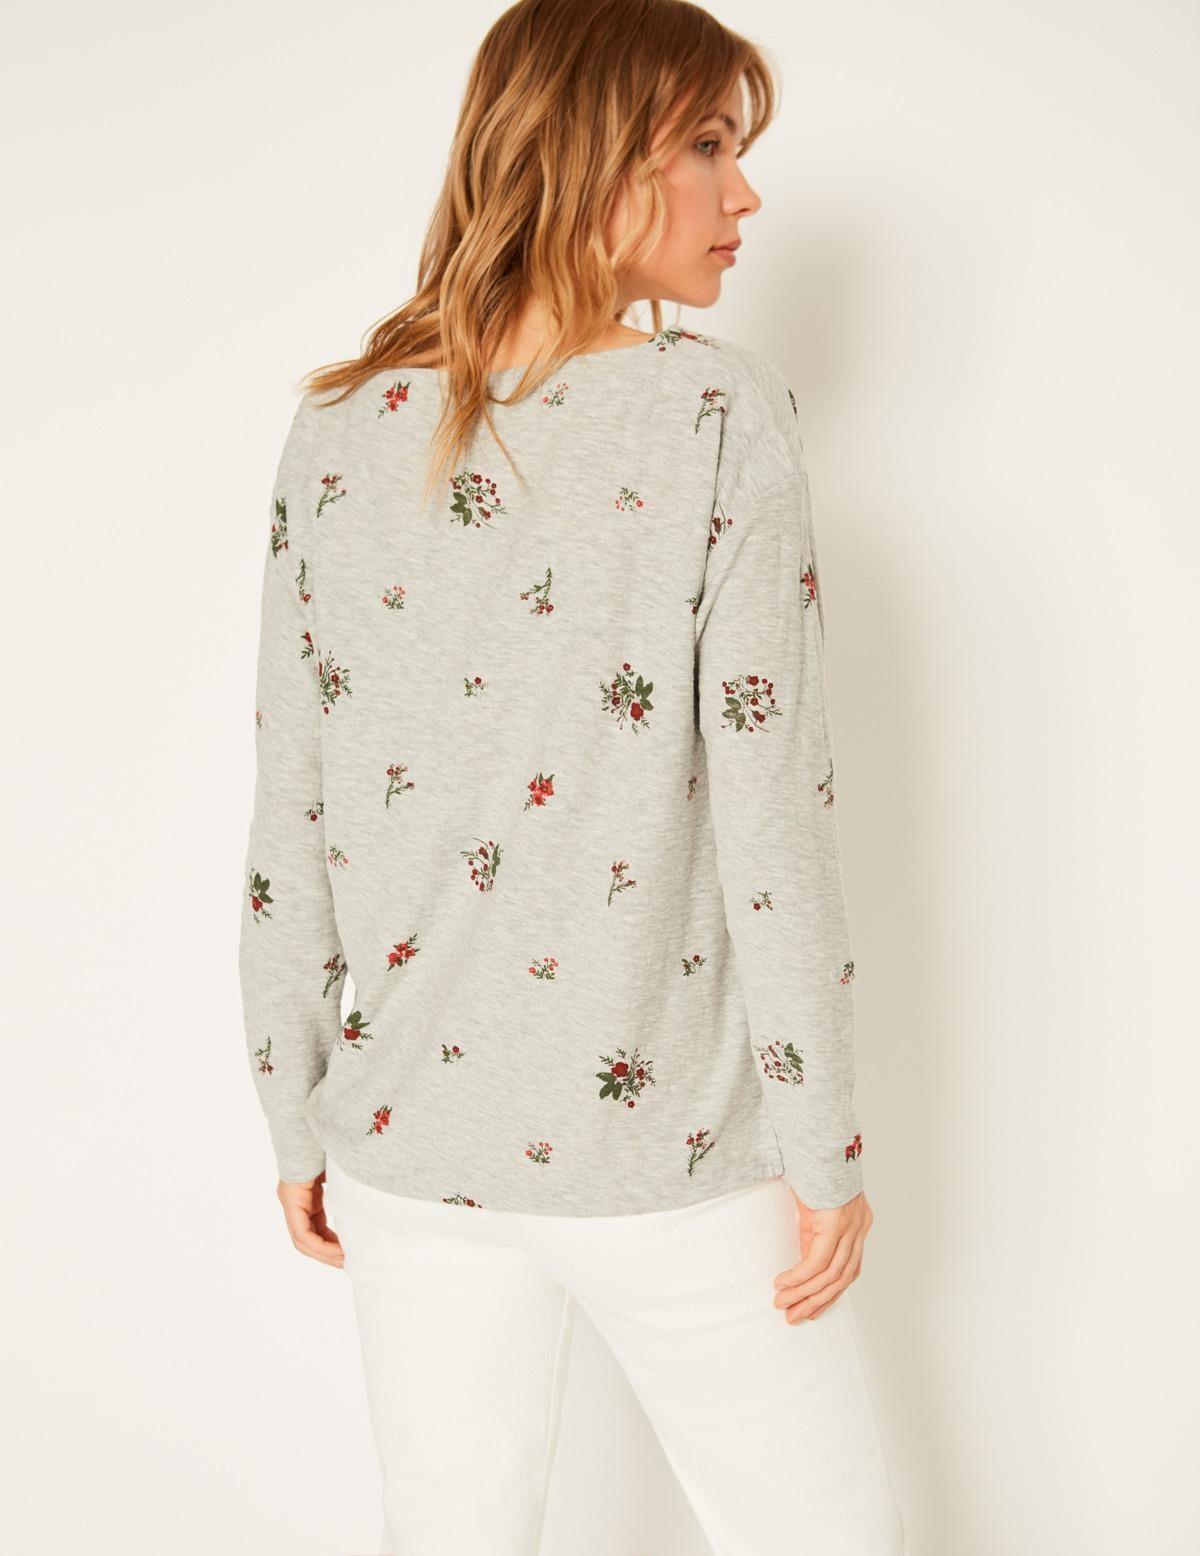 Camiseta flamé flores - Ítem2